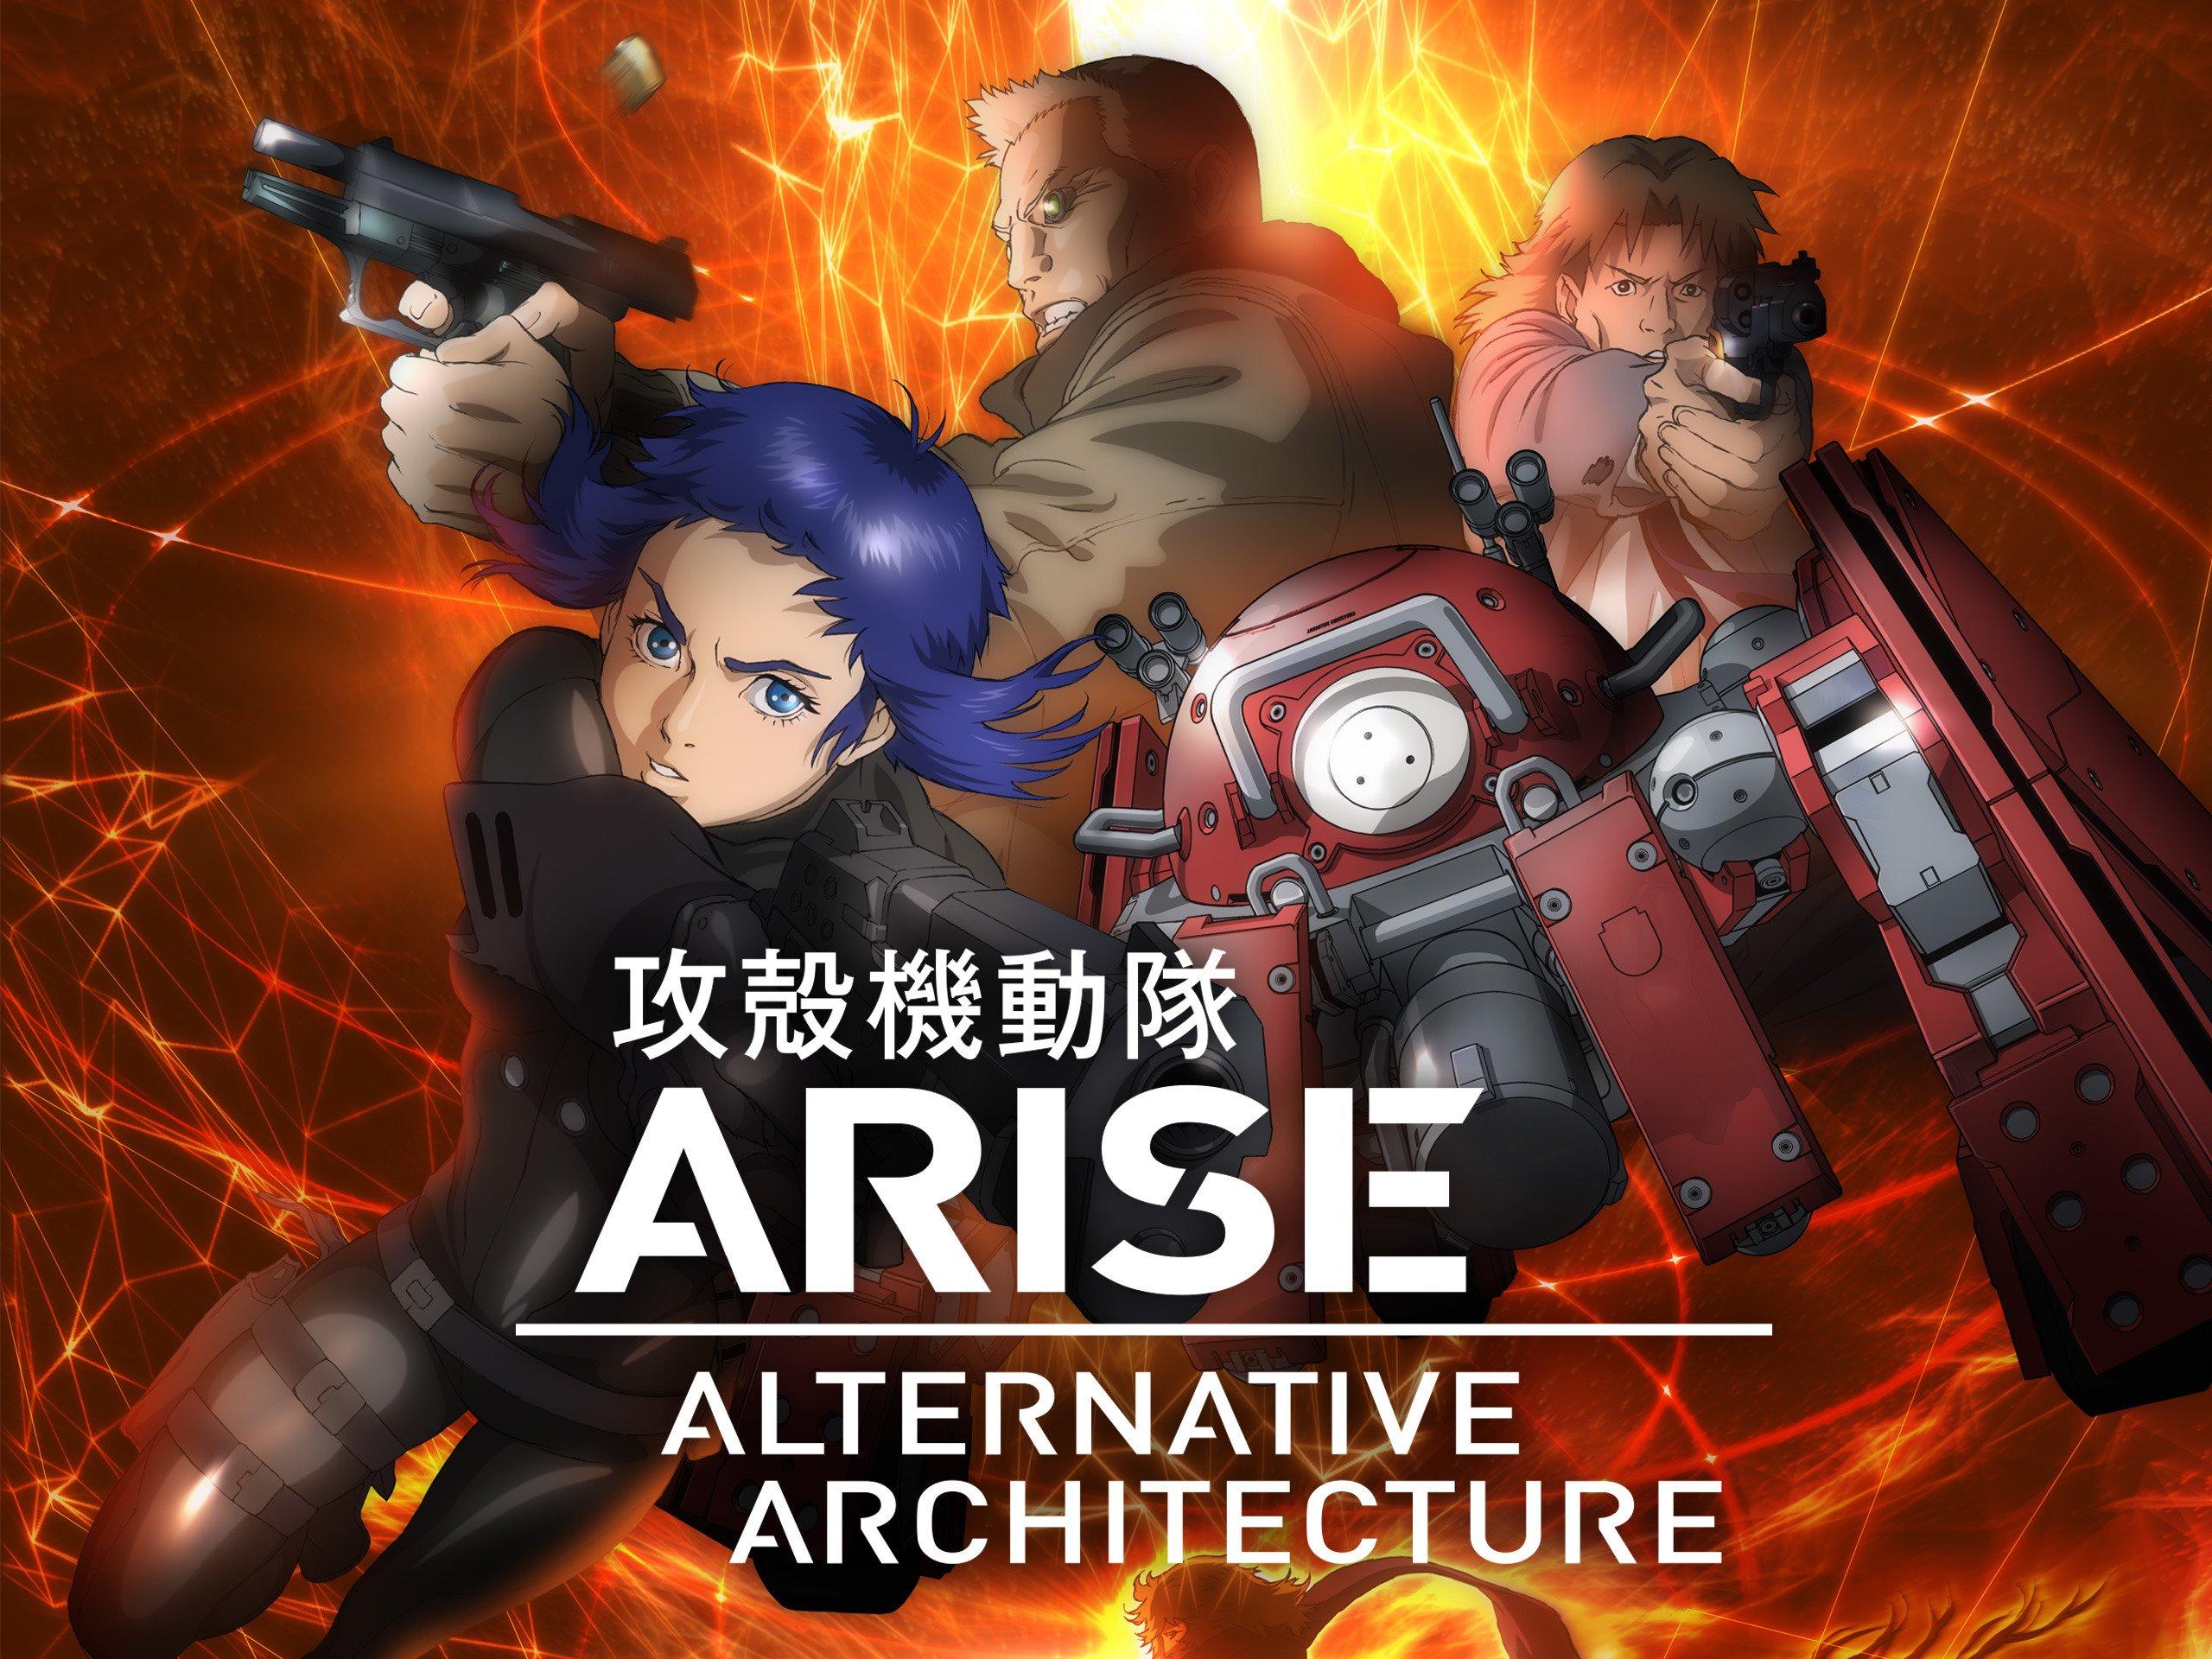 Watch Ghost In The Shell Arise Alternative Architecture Original Japanese Version Season 1 Prime Video